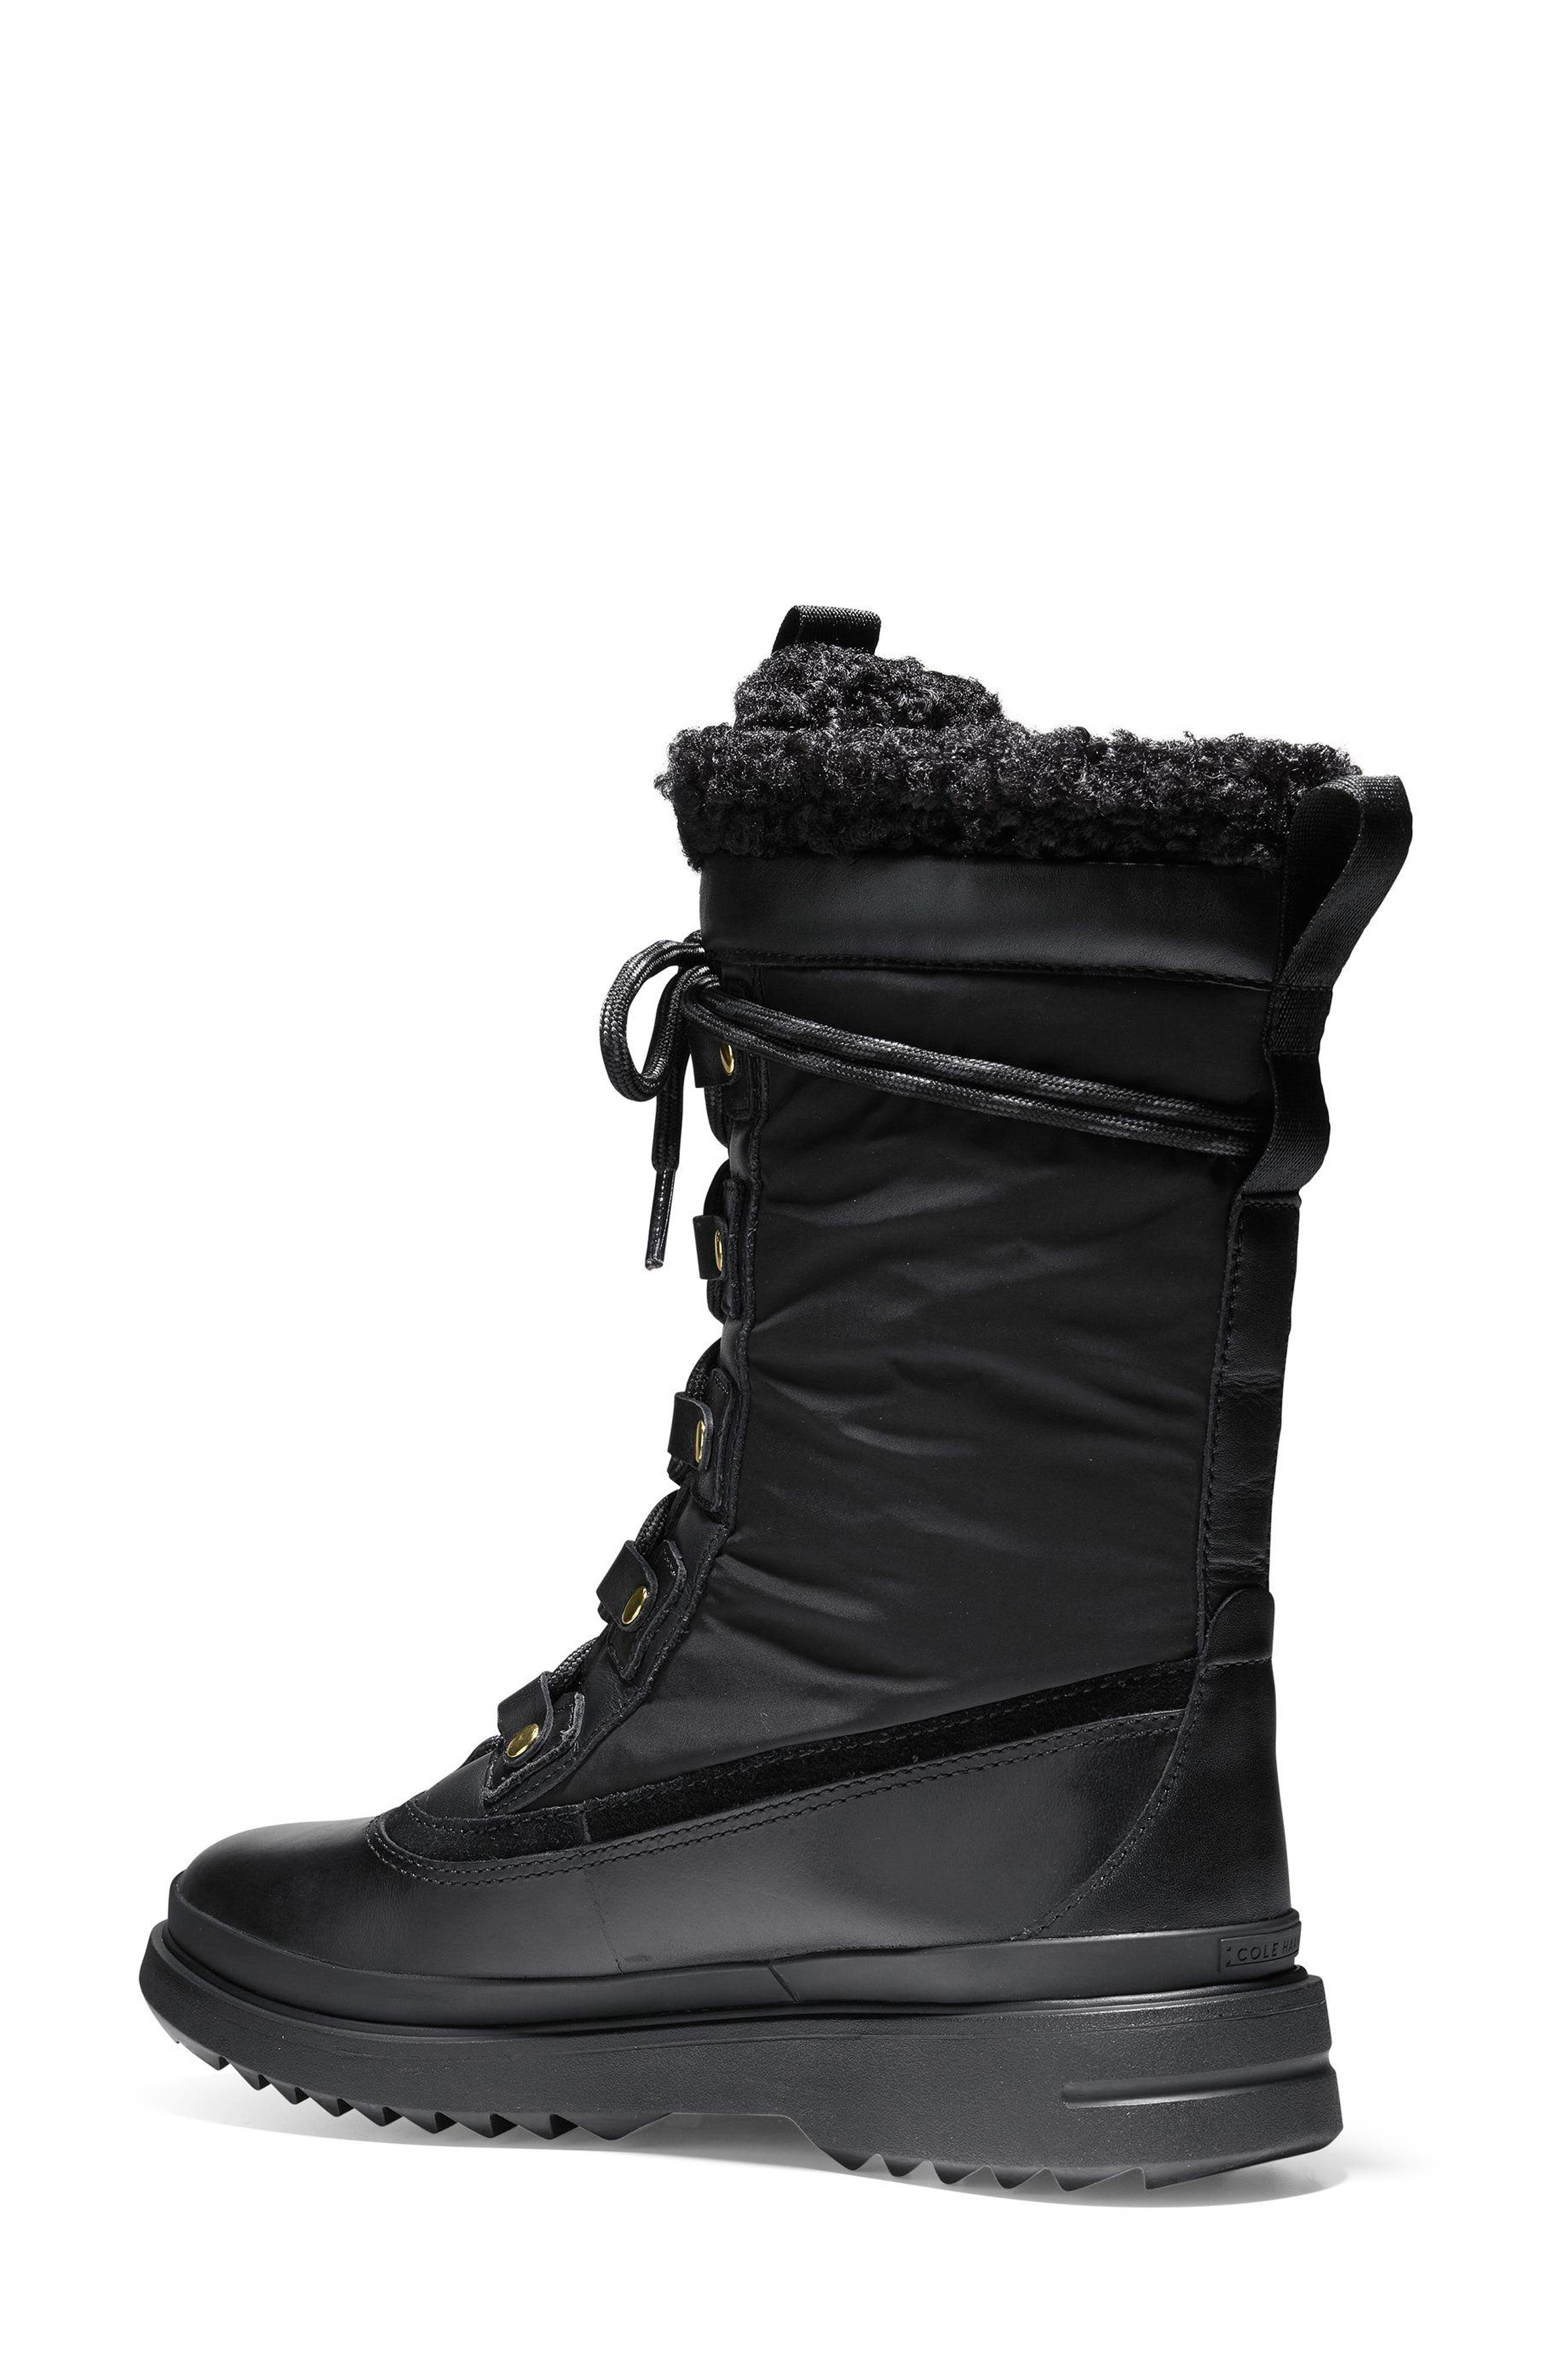 Millbridge Waterproof Boot,                             Alternate thumbnail 2, color,                             Black Leather